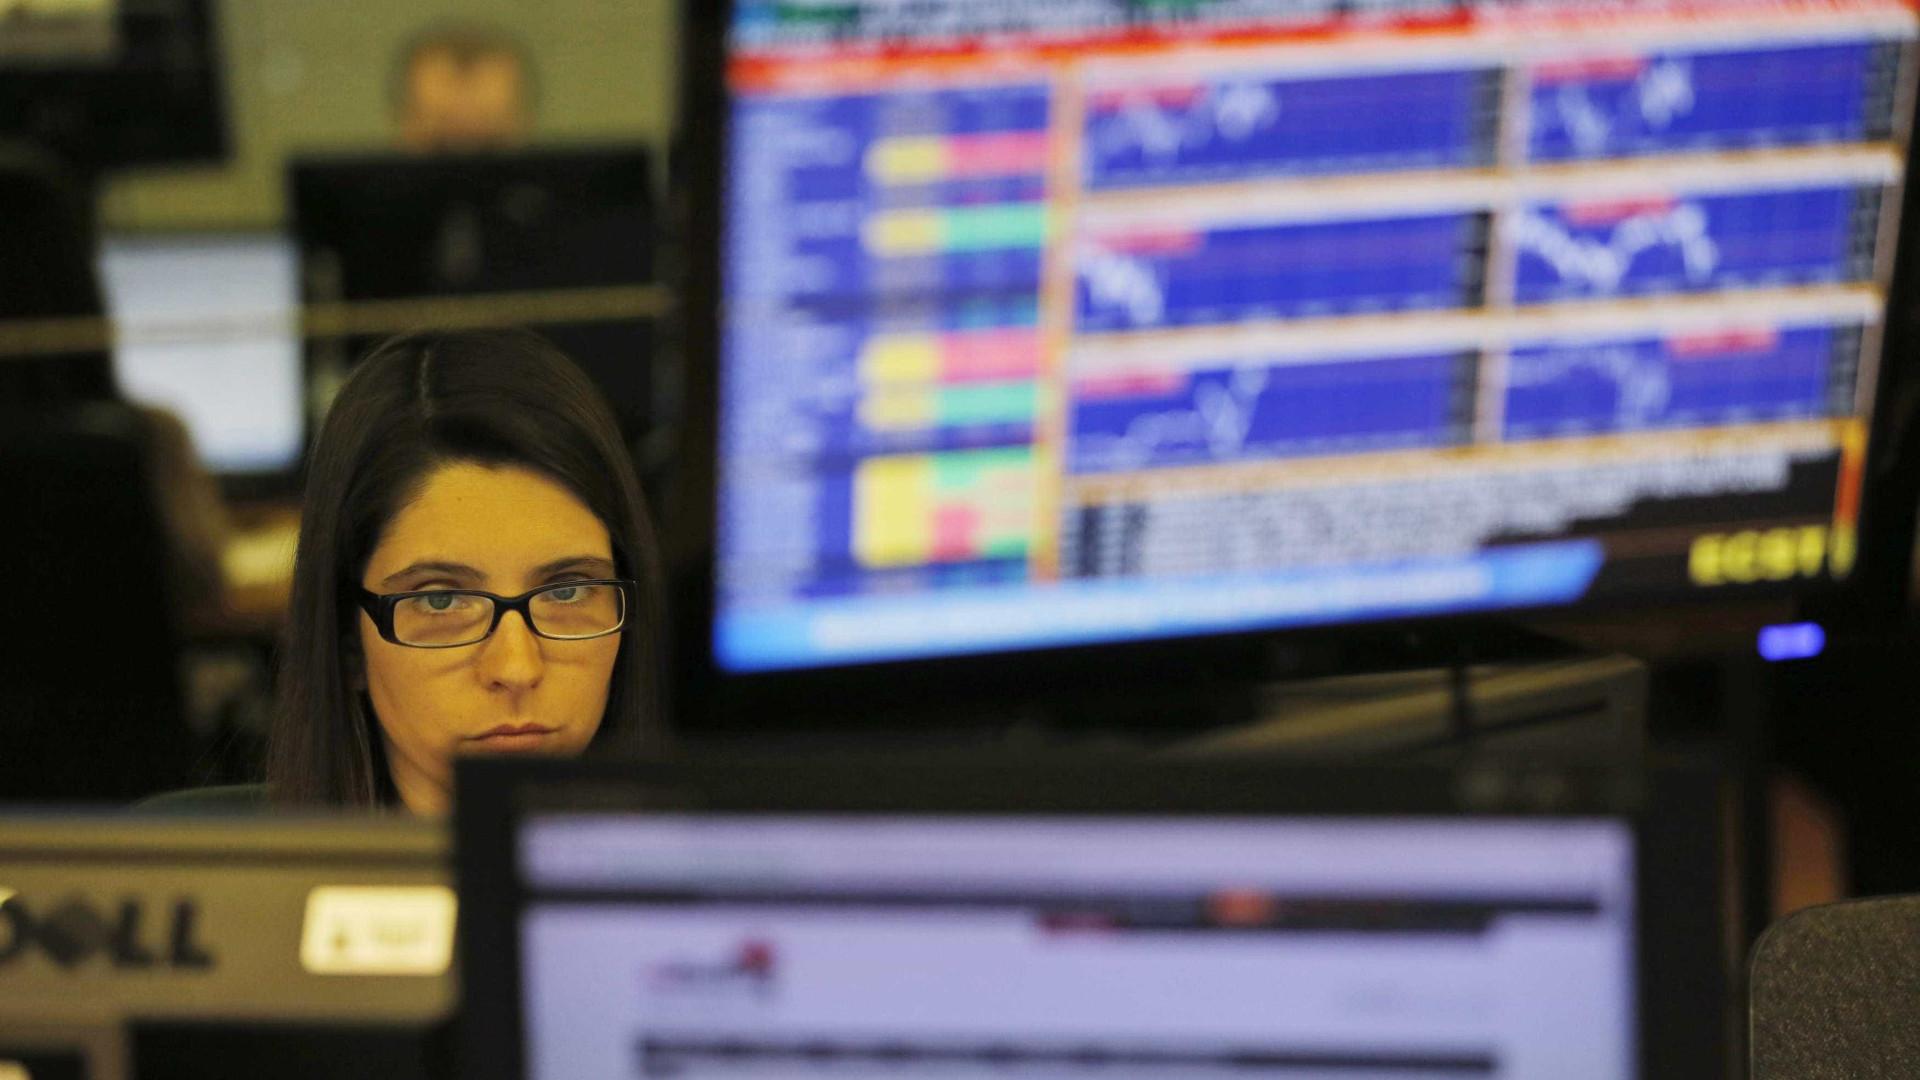 PSI20 sobe 0,11% e Mota-Engil lidera subidas